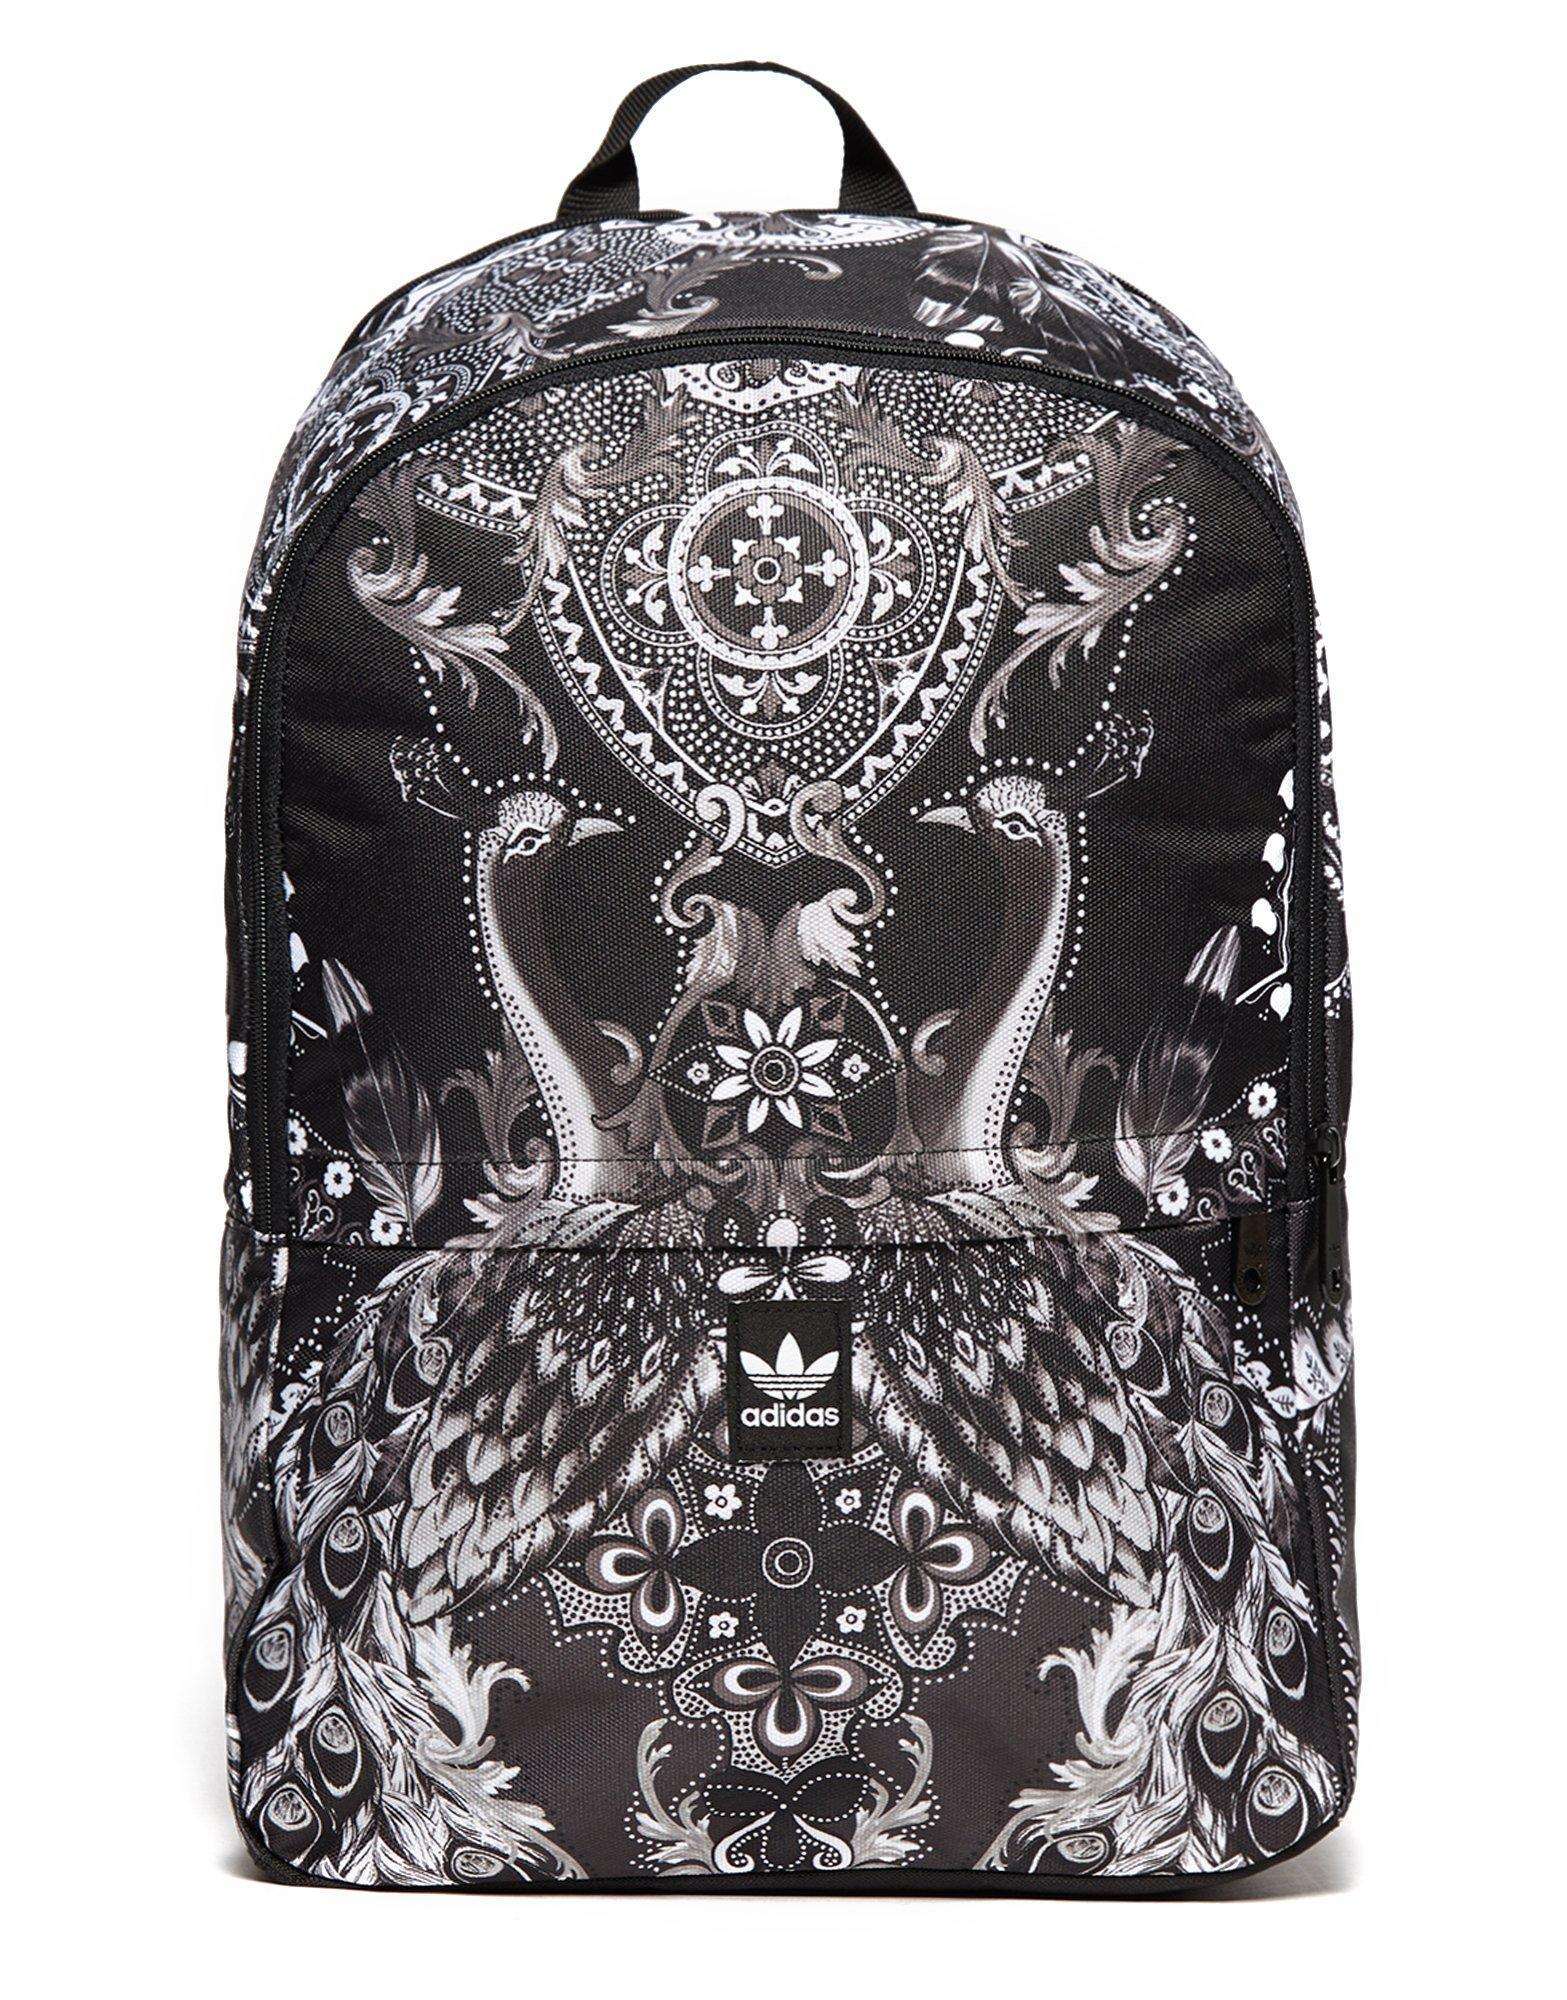 72cdfdd0b768 Lyst - adidas Originals Essentials Pavao Backpack in Black